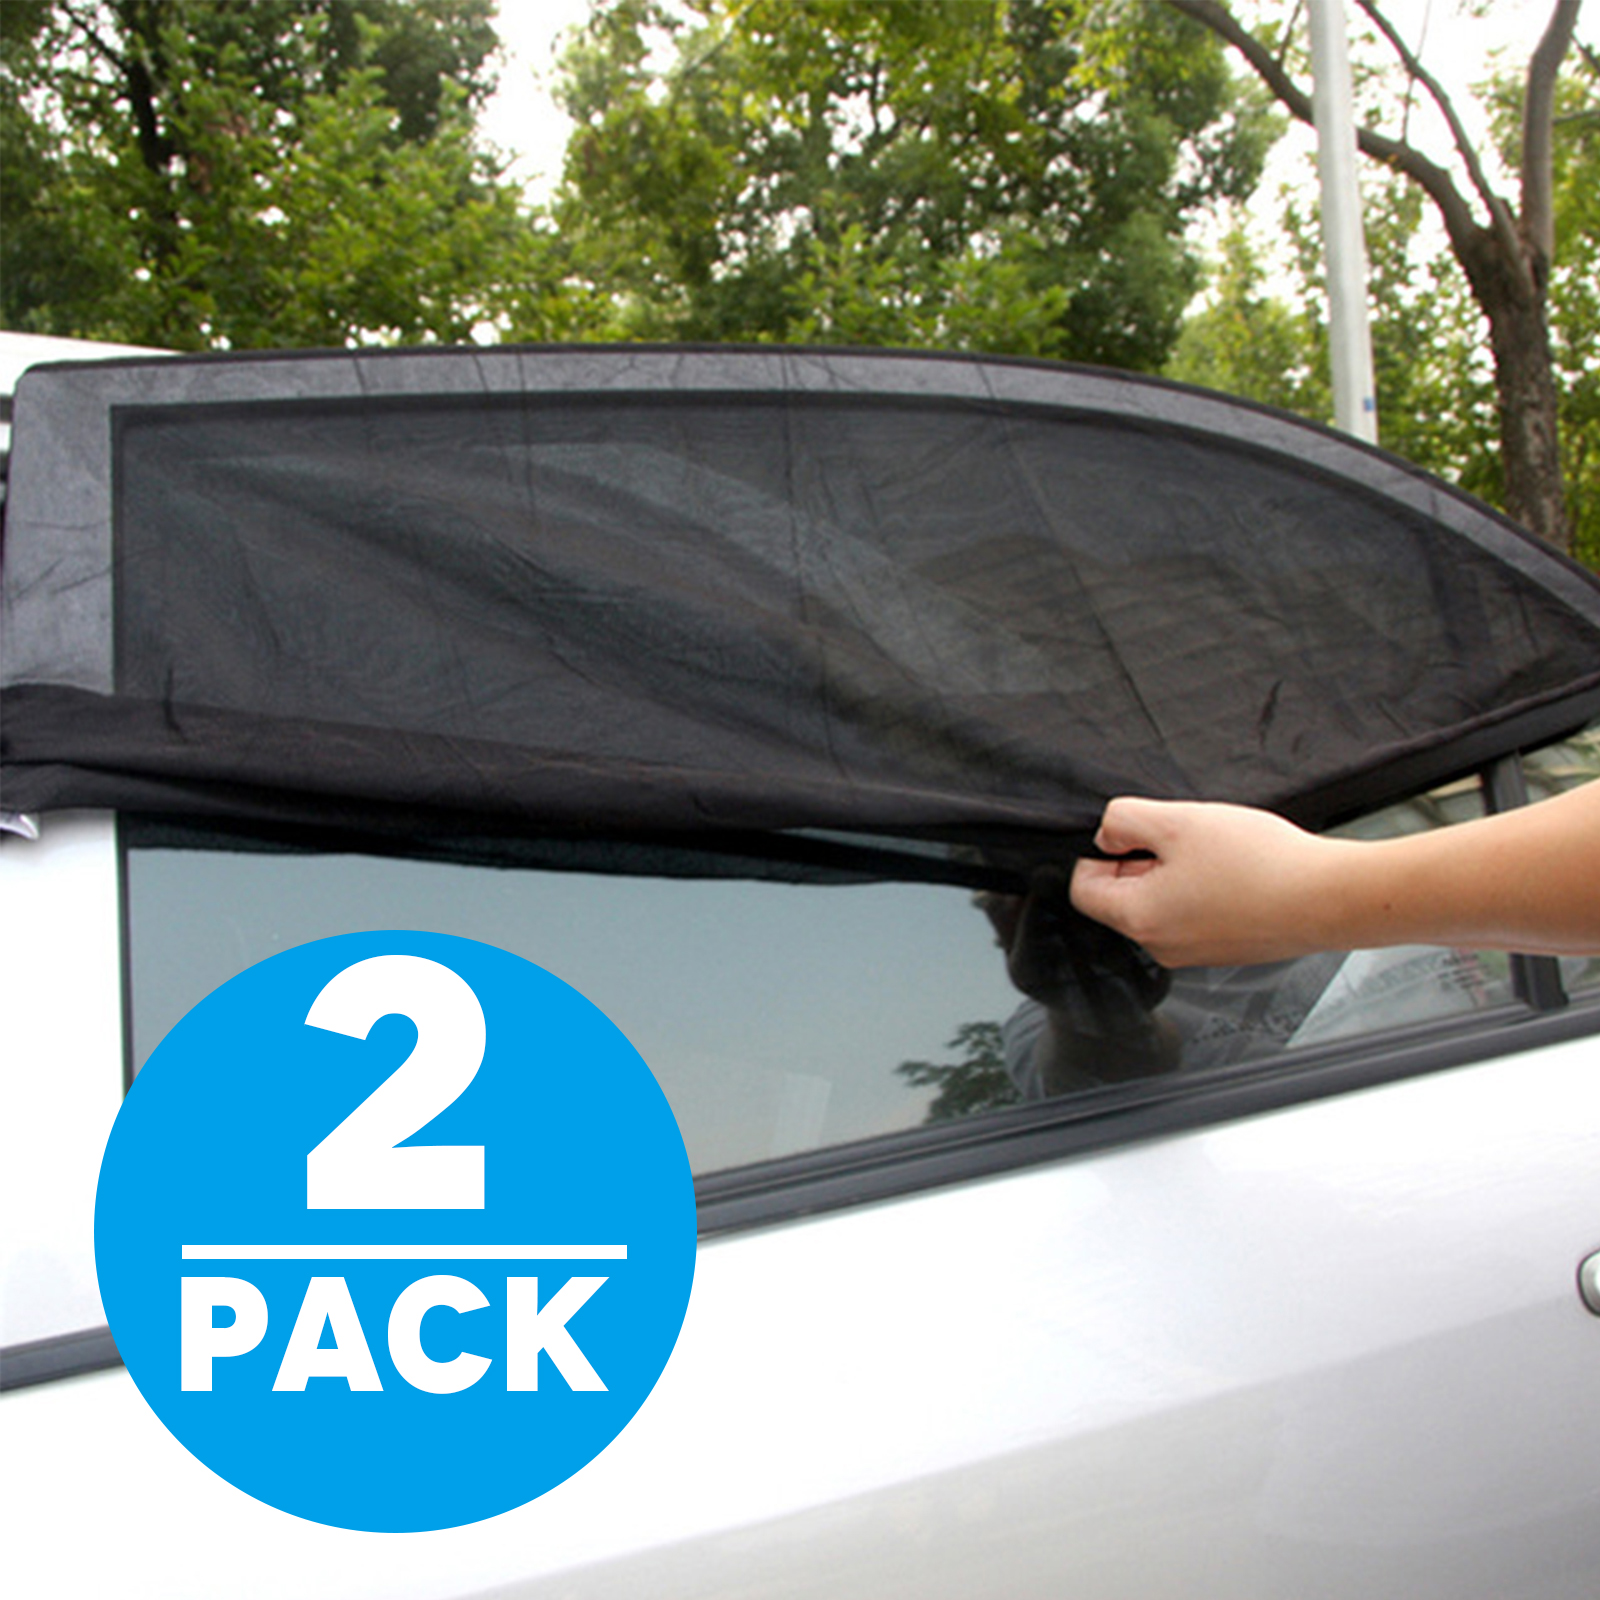 TSV 2-pack Car SUV Premium Rear Side Window Sun Visor Shade Mesh Cover Shield Sunshade UV Protector, Universal Fit Car Trucks and SUV etc.